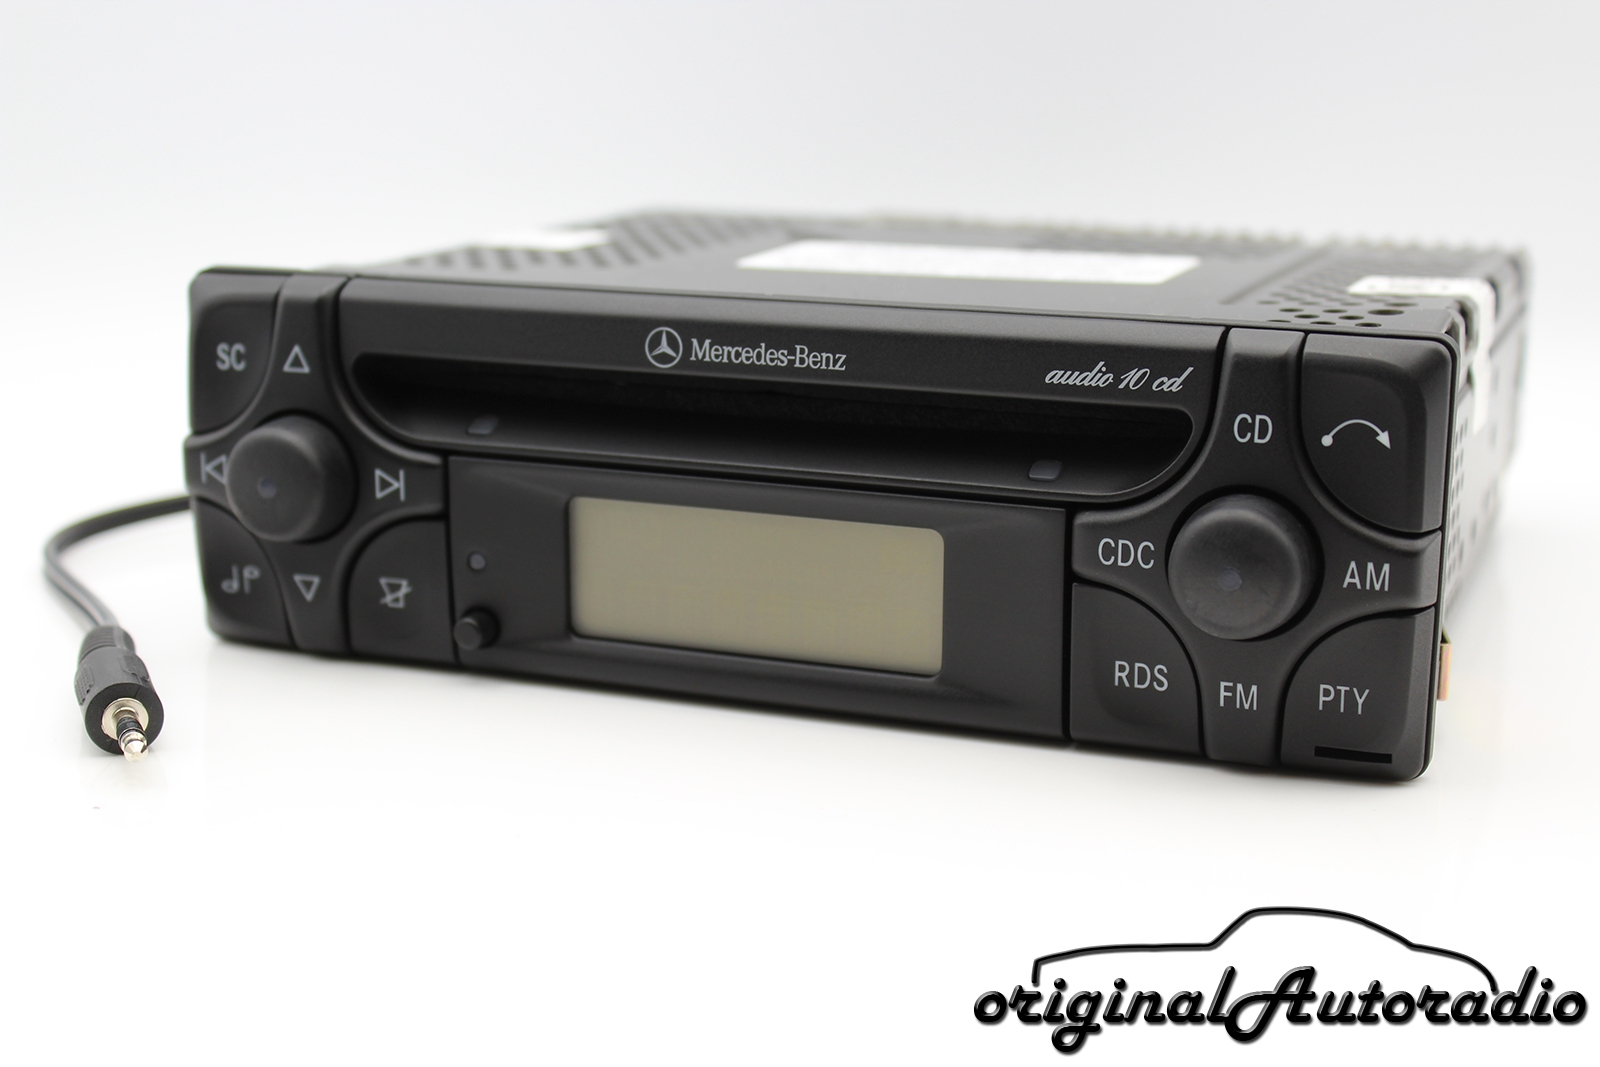 Original Autoradio De Im Austausch Mercedes Audio 10 Cd